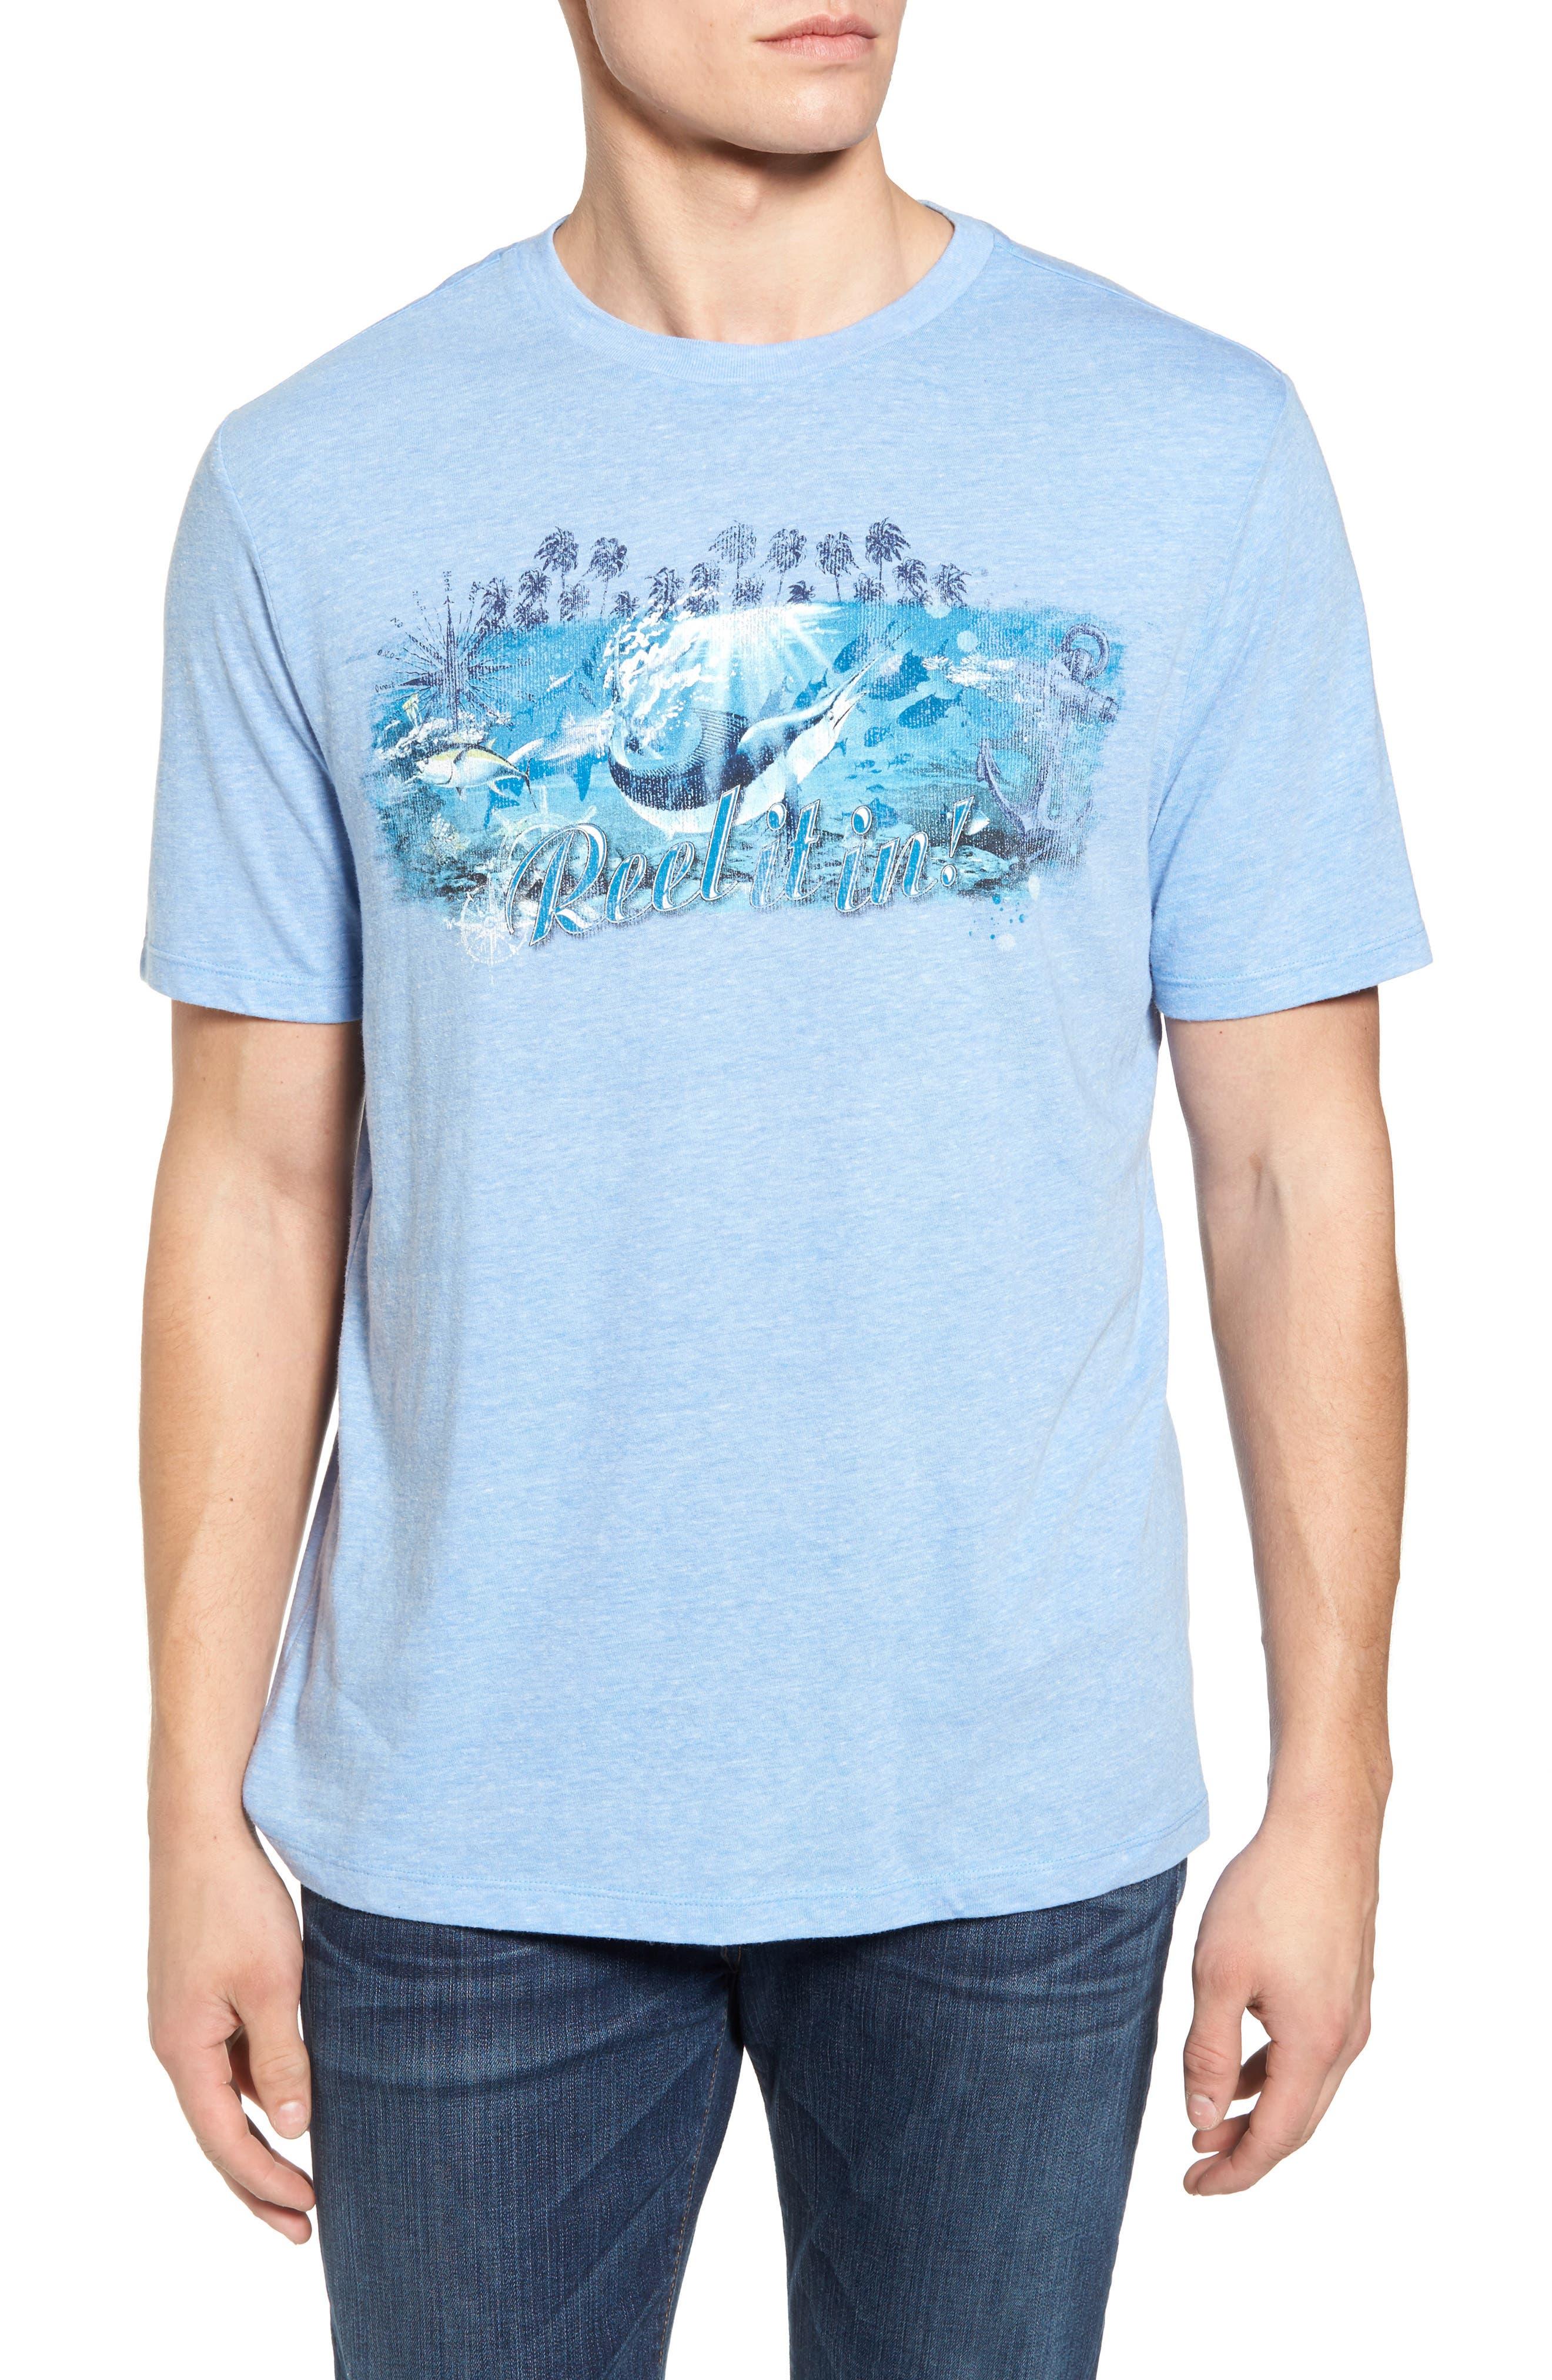 Nat Nast Reel Life Graphic T-Shirt